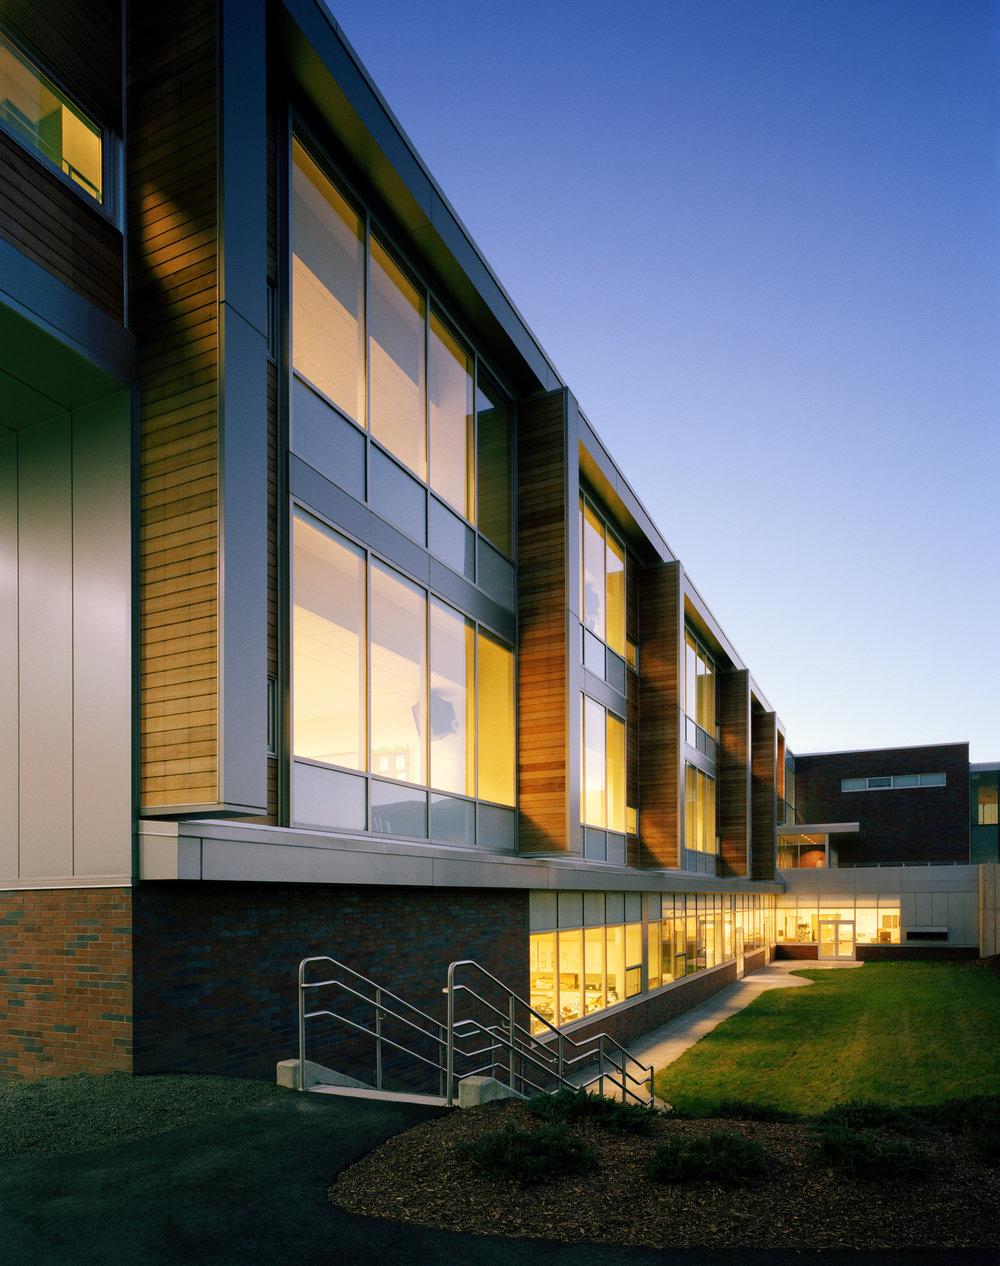 Fairfield+Middle+School_13890_Ext+Dusk+Detail+1_MR.jpg